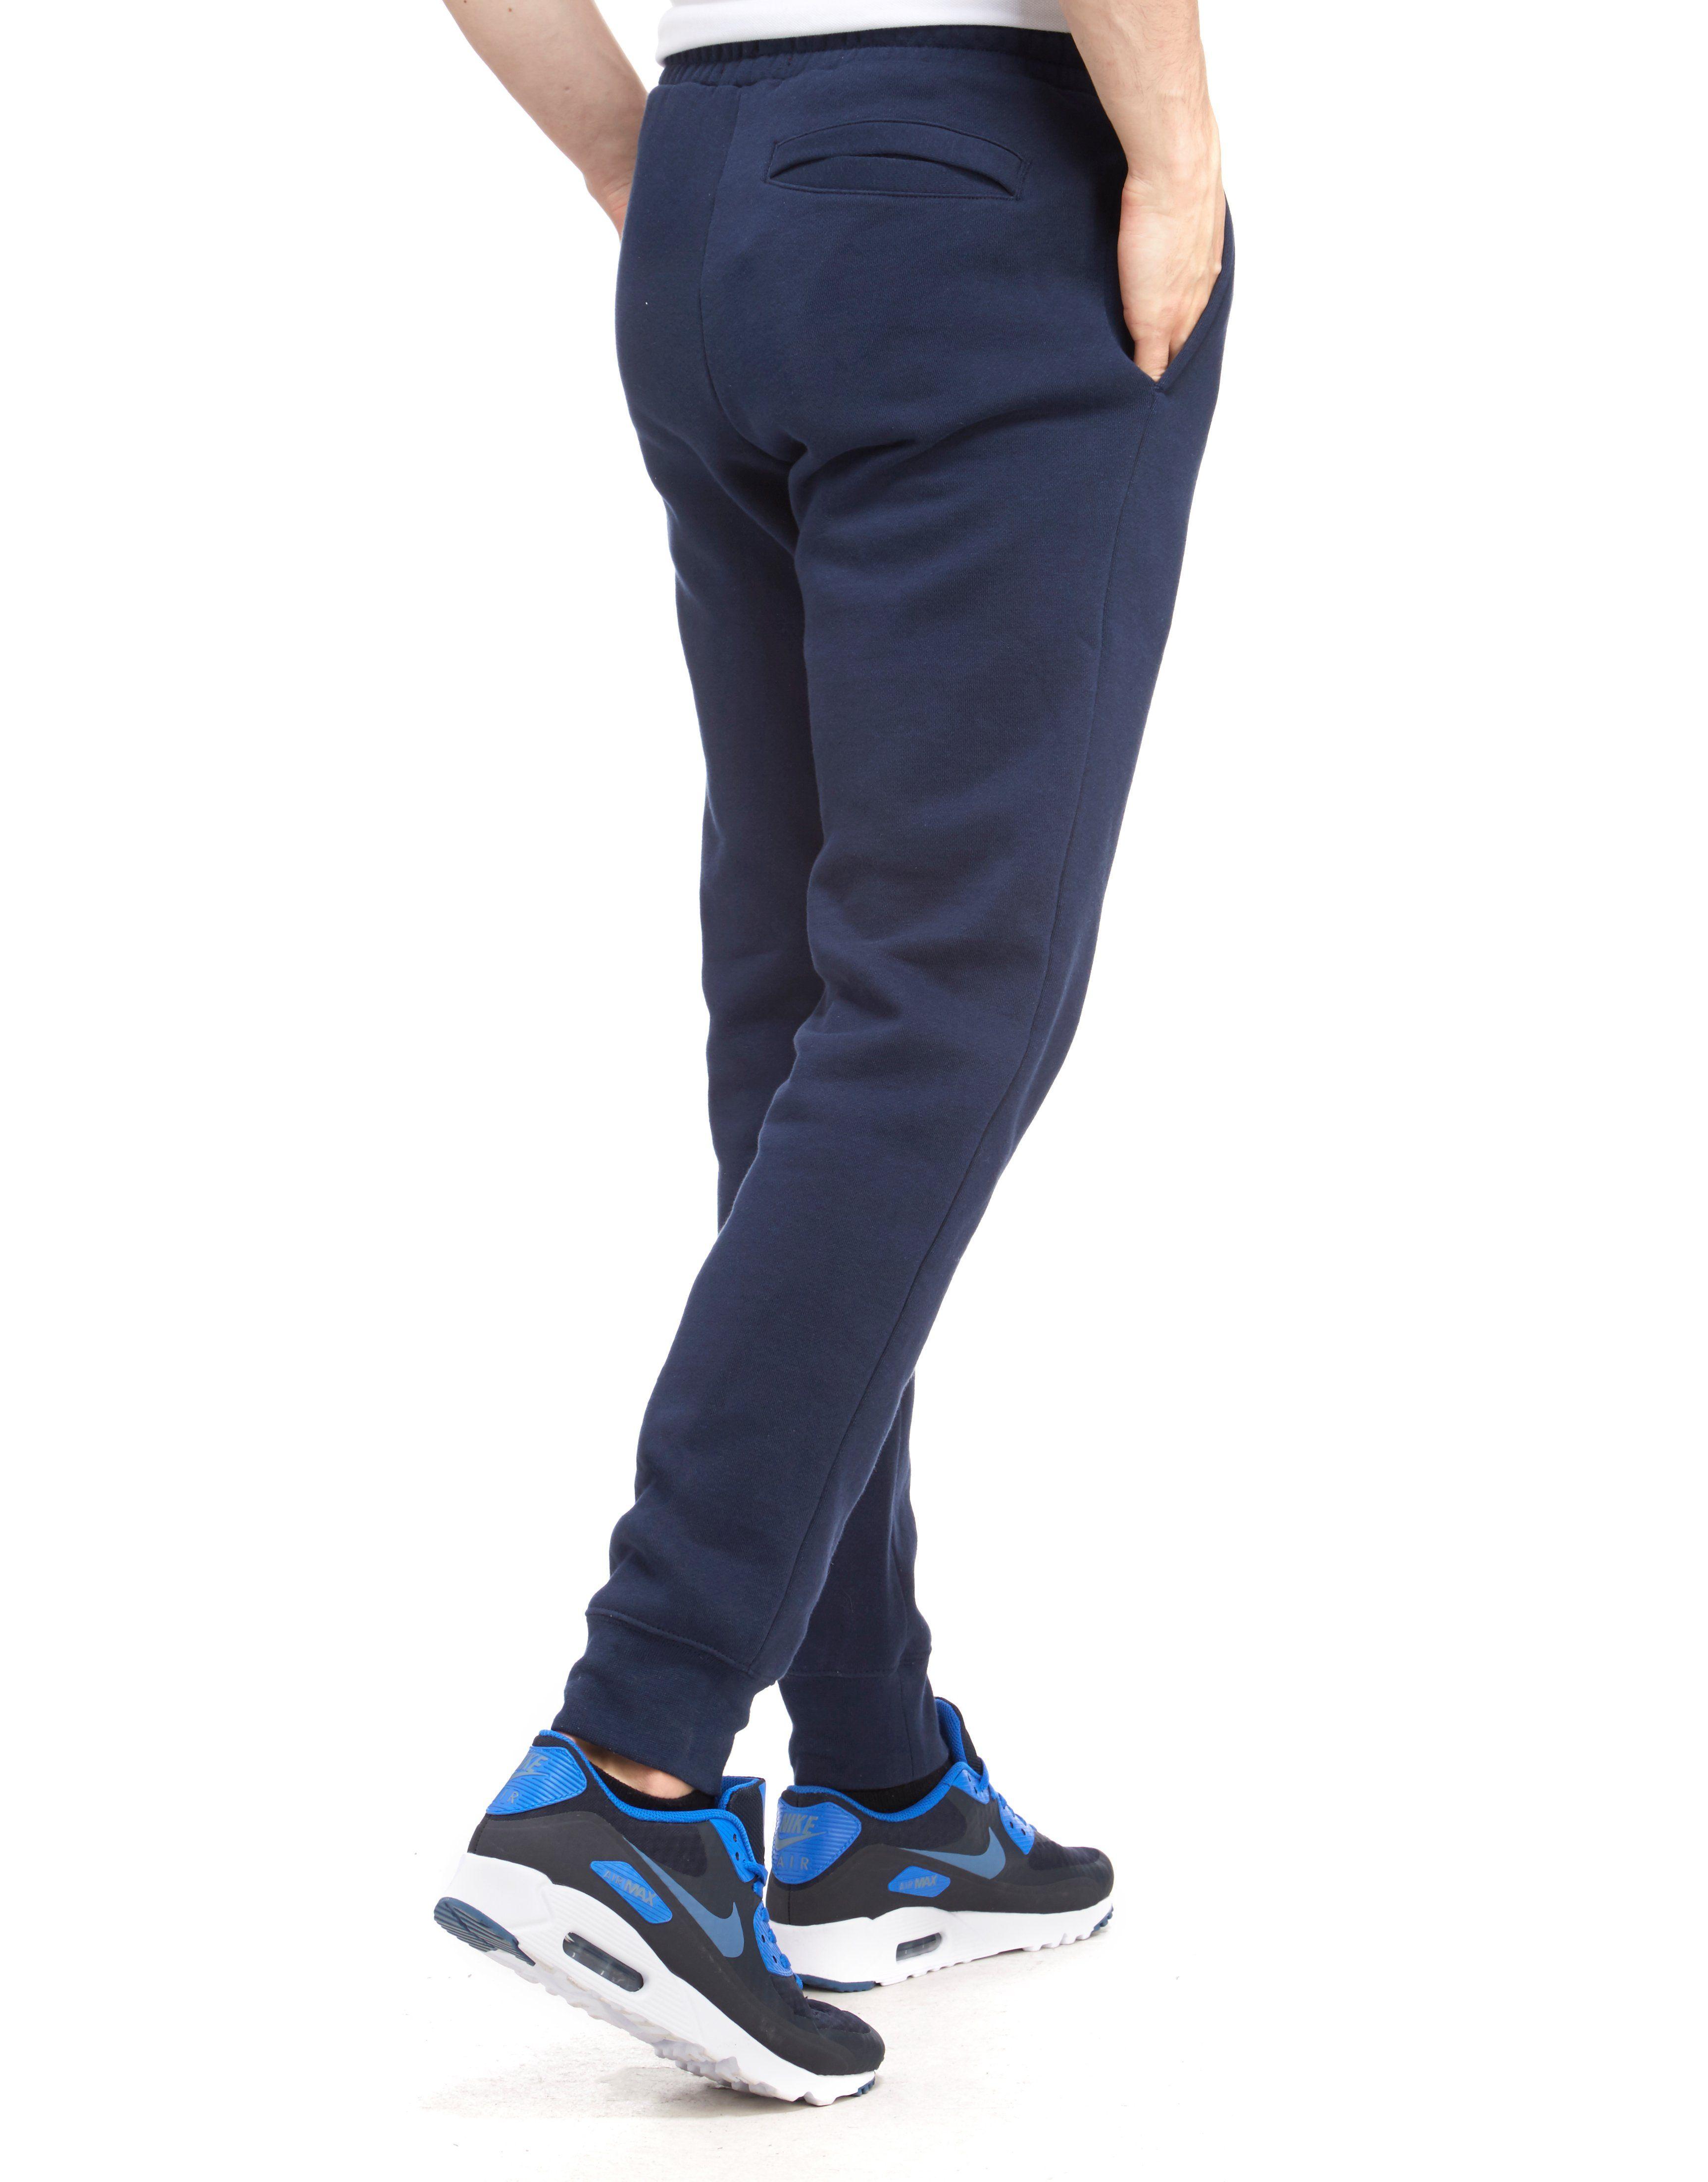 Simple Nike Air Max Jogging Pants - JD Sports